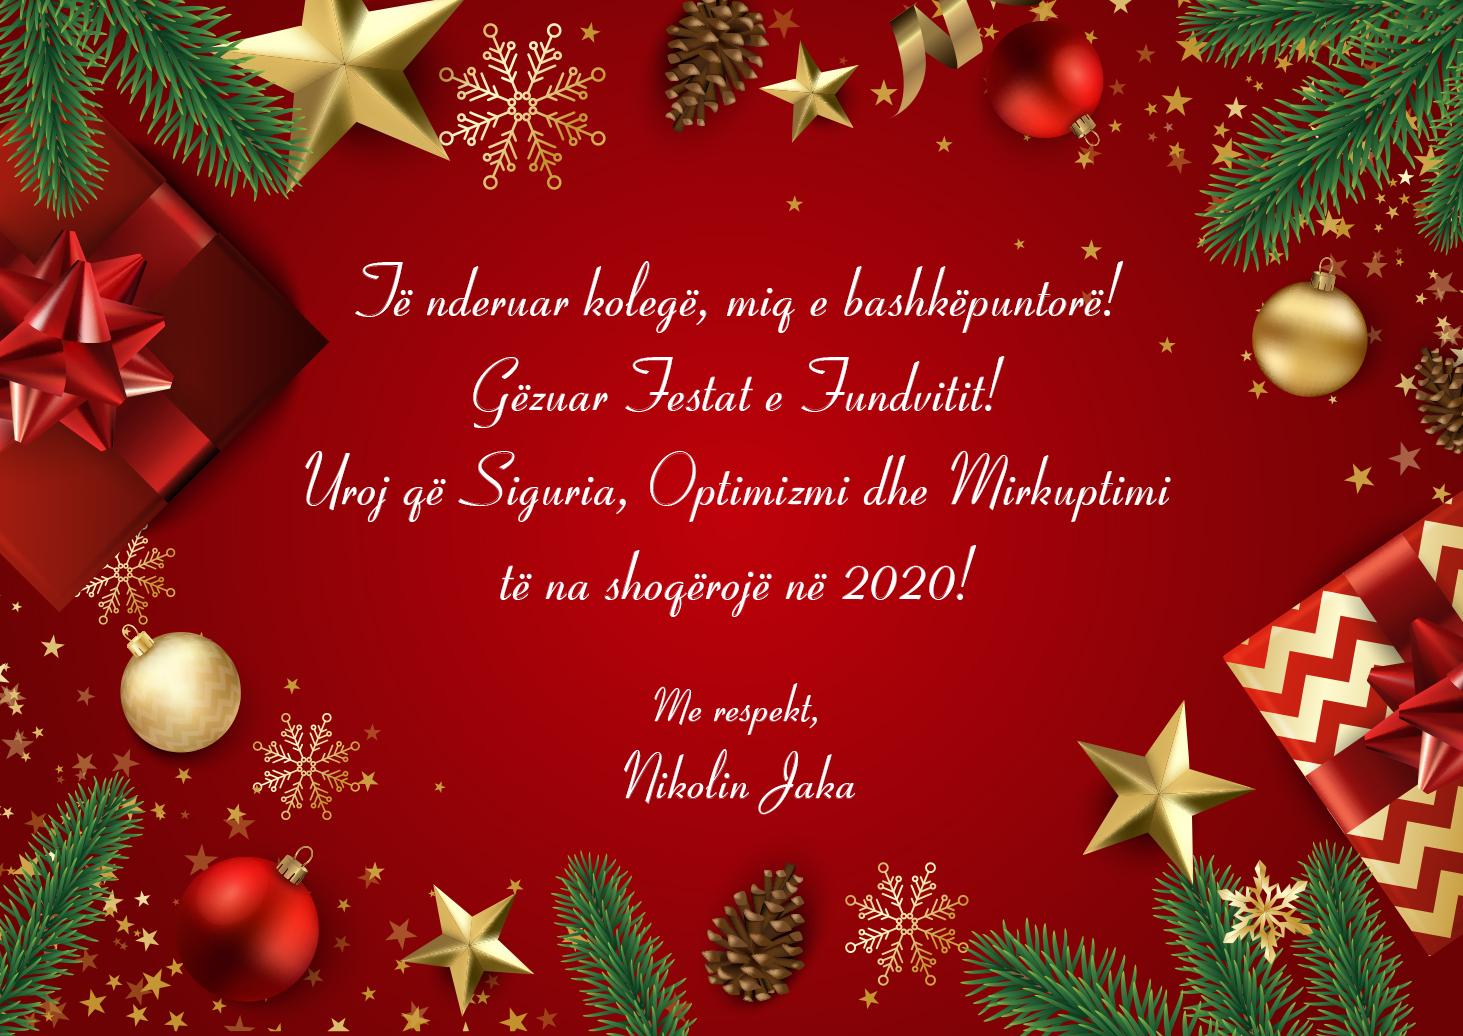 Greetings from Mr. Nikolin Jaka